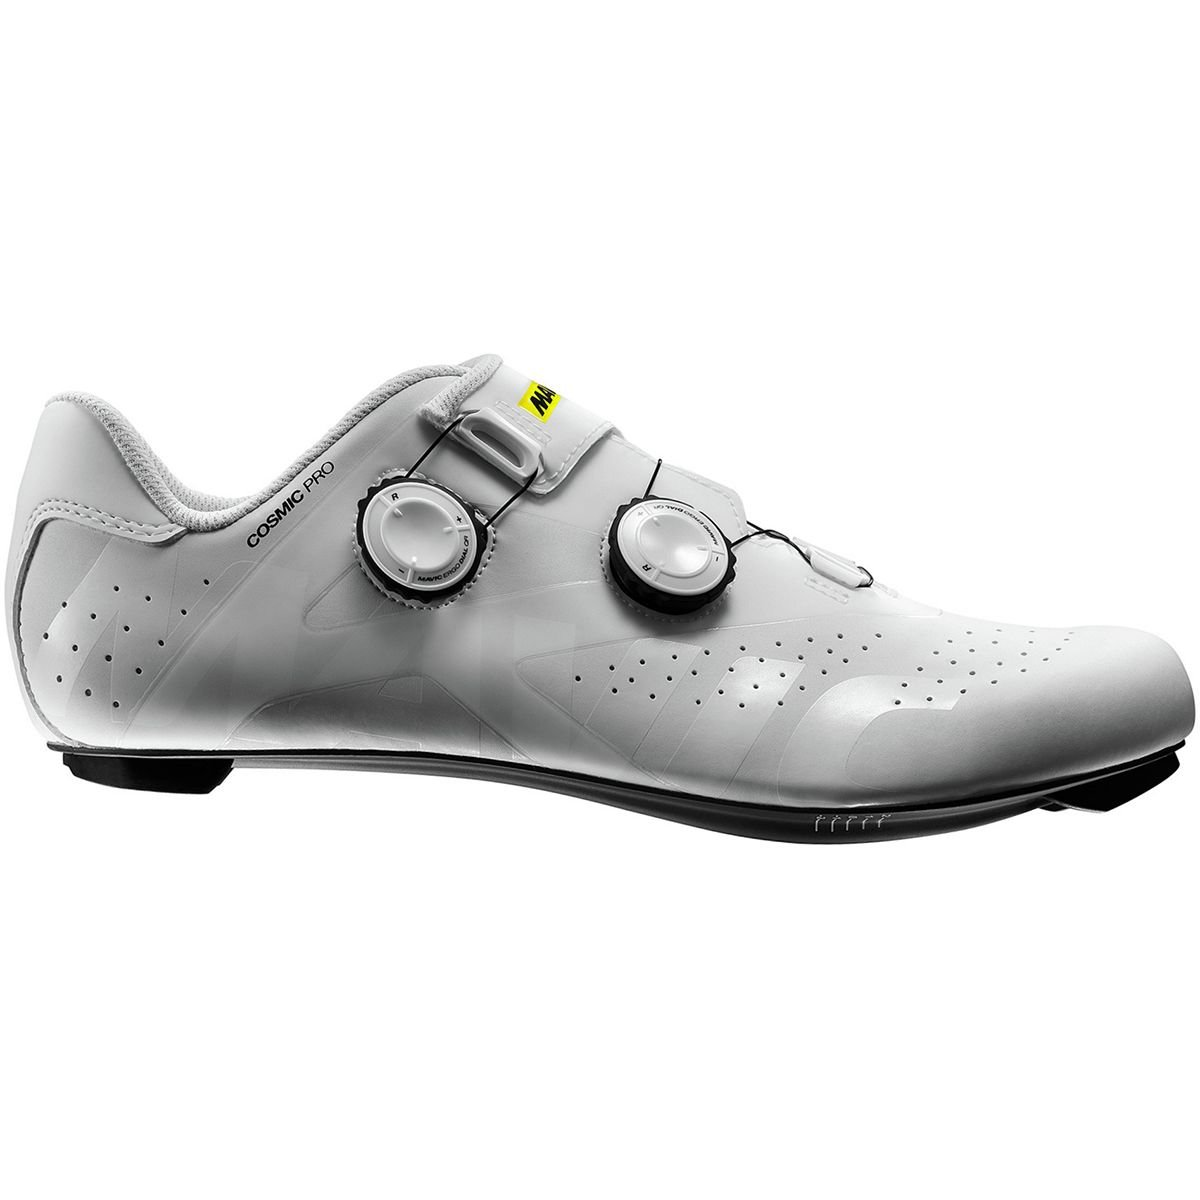 Mavic Cosmic Pro Cycling Shoes - Men's B078S4YGG9 8 D(M) US|White/White/Black